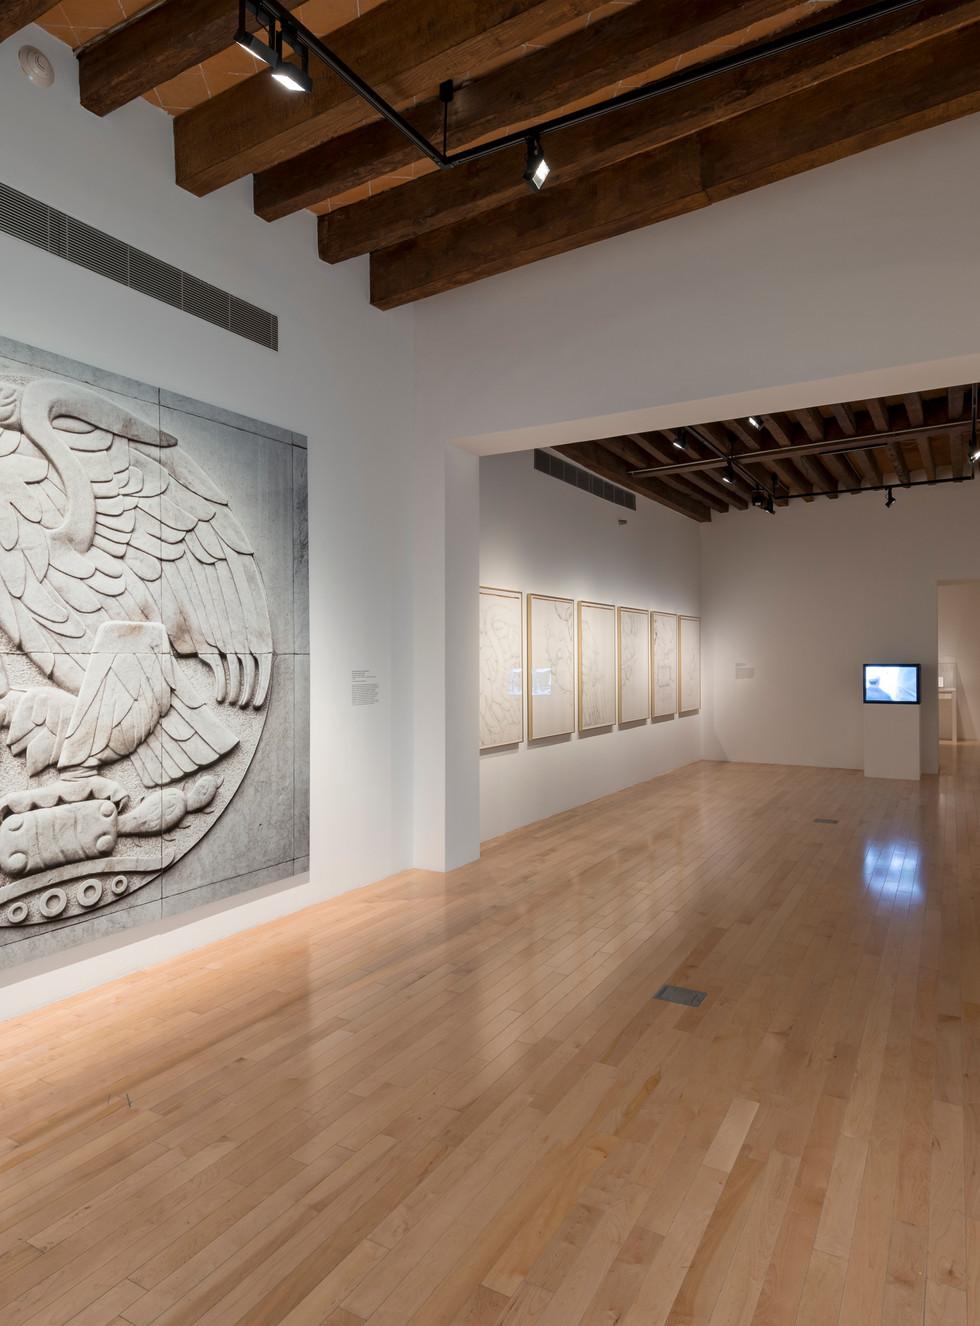 Courtesy of Proyectos Monclova / Tercerunquinto / Museo Amparo